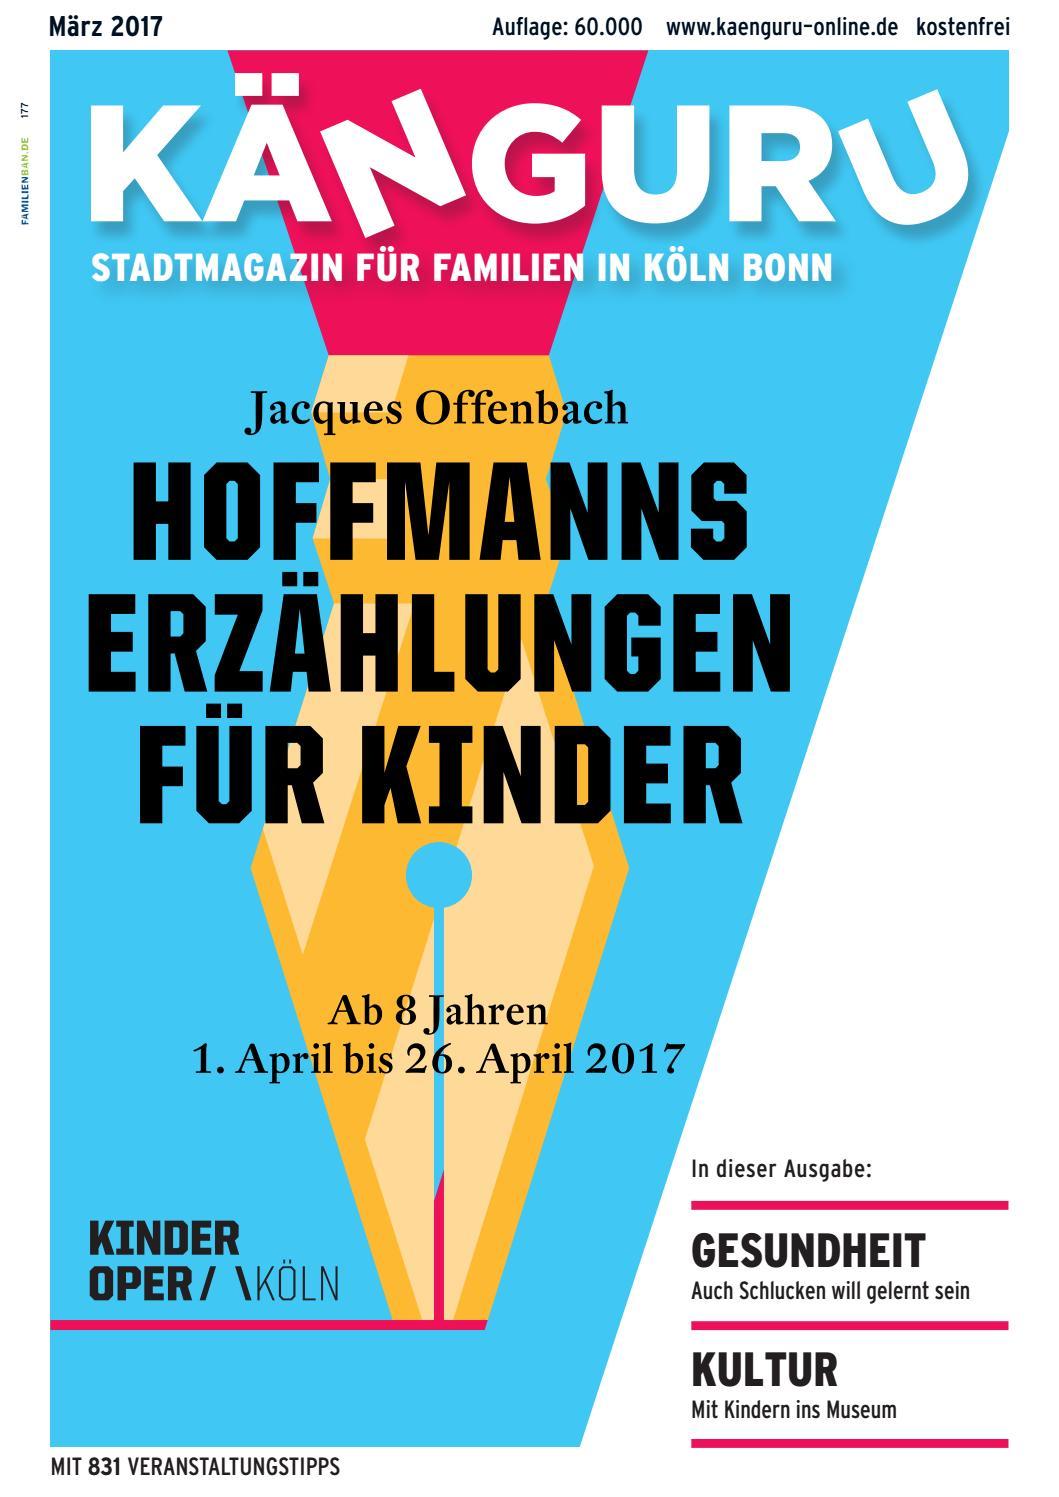 KÄNGURU Stadtmagazin für Familien in KölnBonn März 2017 by Känguru Colonia  Verlag - issuu